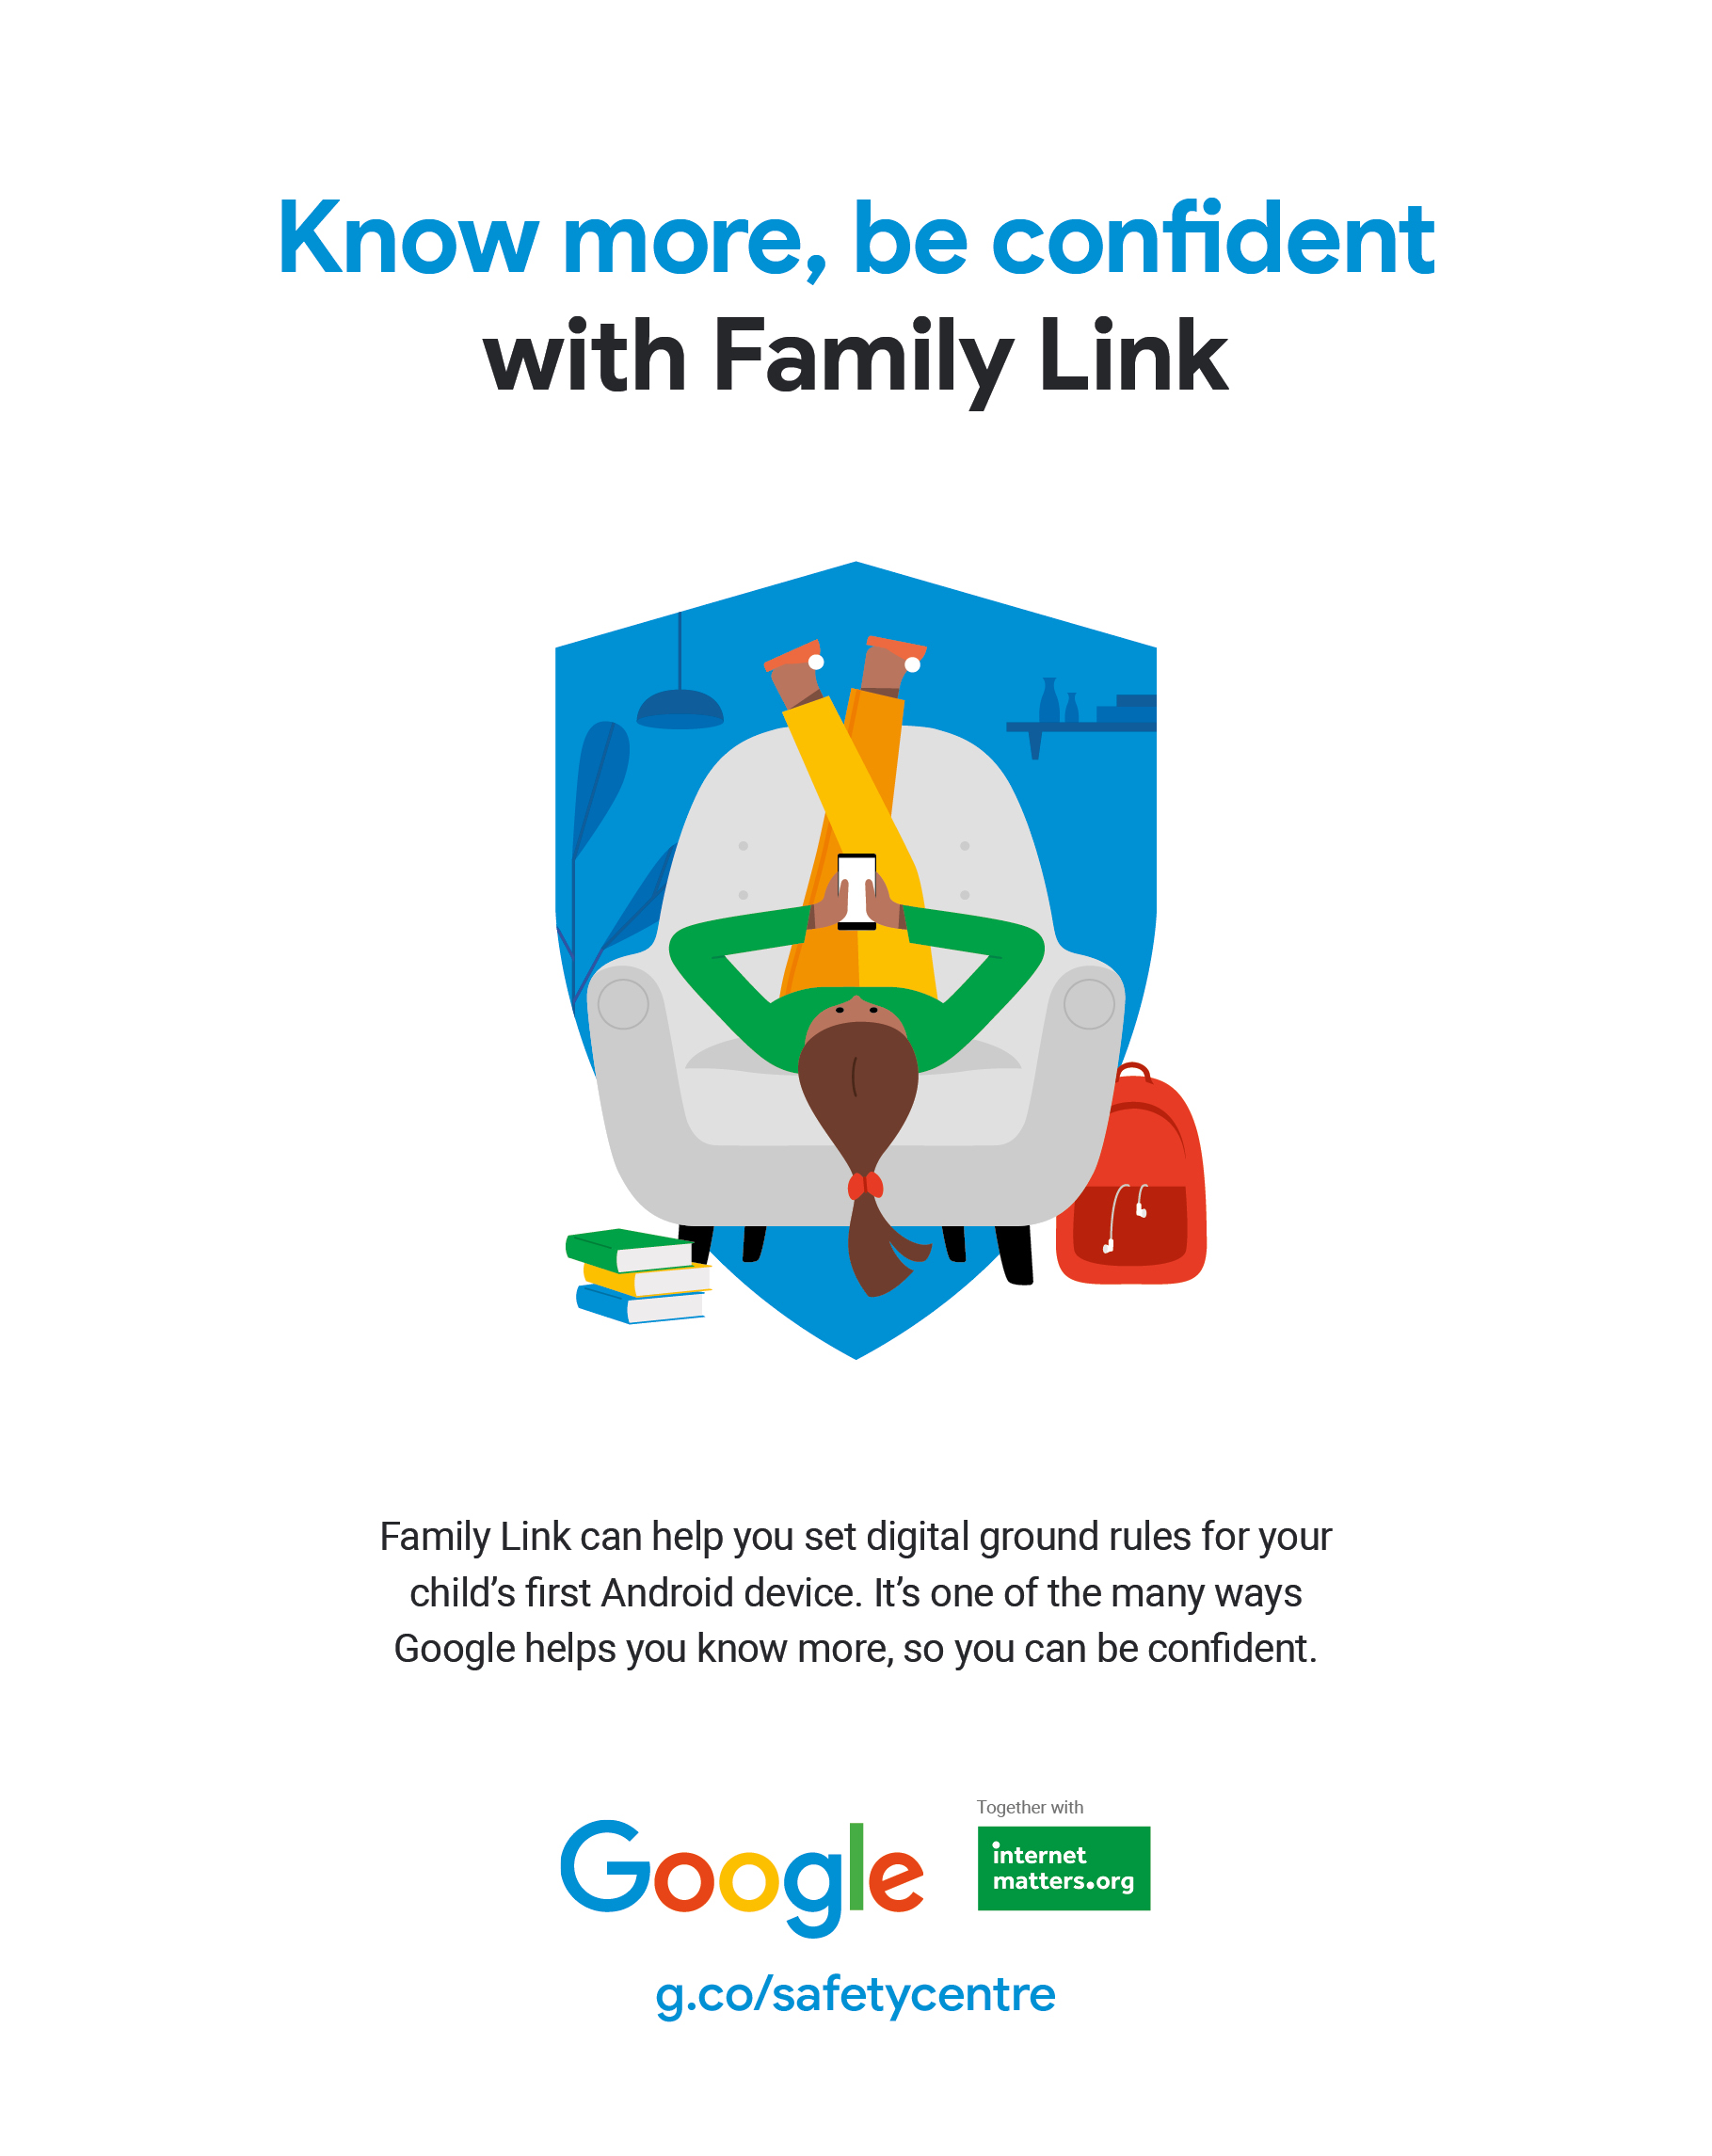 West_P18_GoogleOS_FamilyLink_154x194.jpg